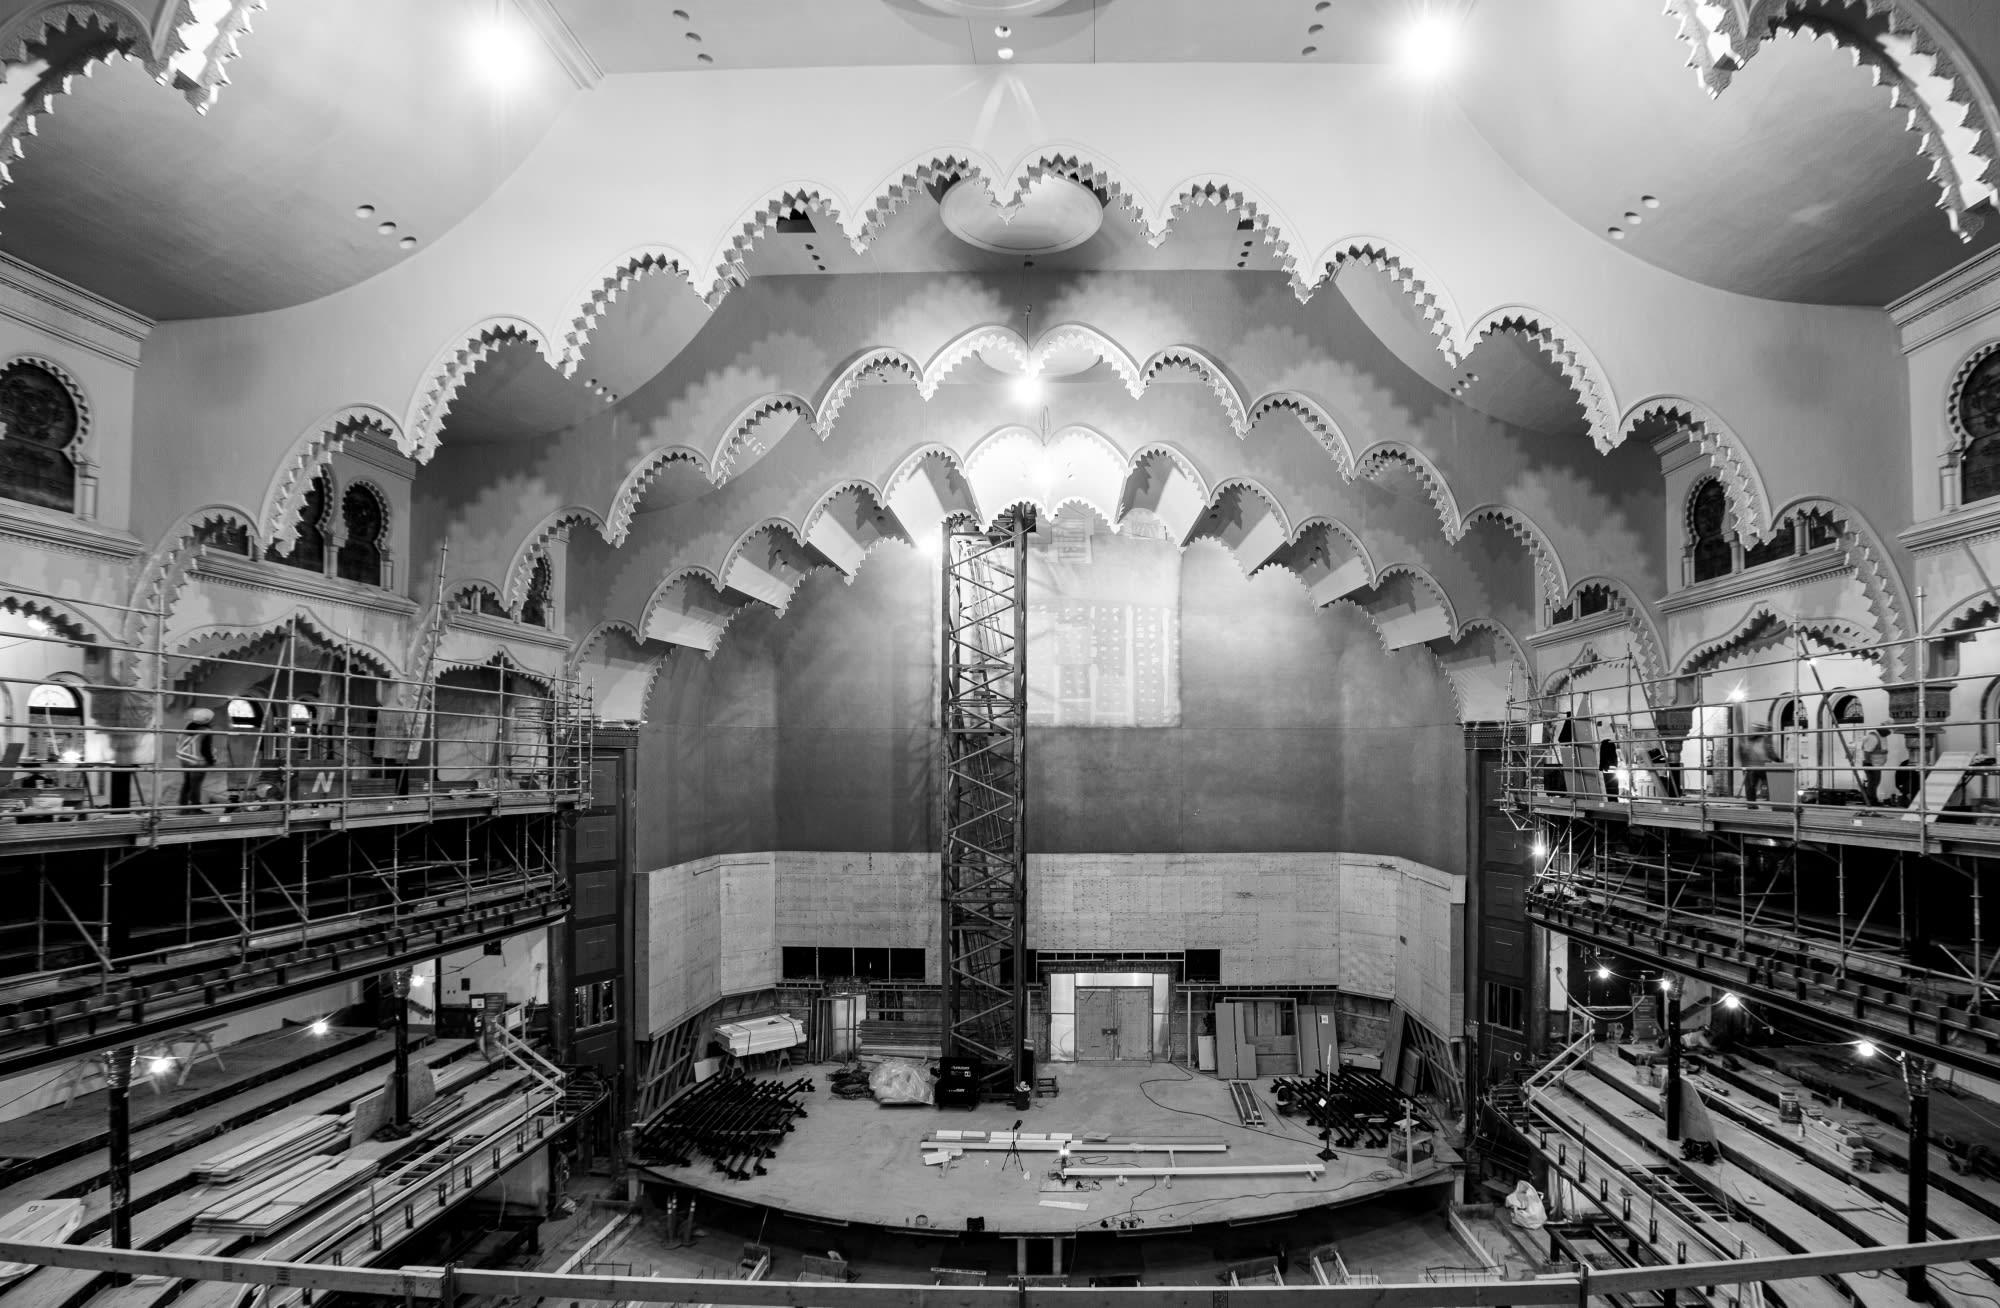 AFTER: Wide shot of ceiling arches, post-restoration, Nov 2020.